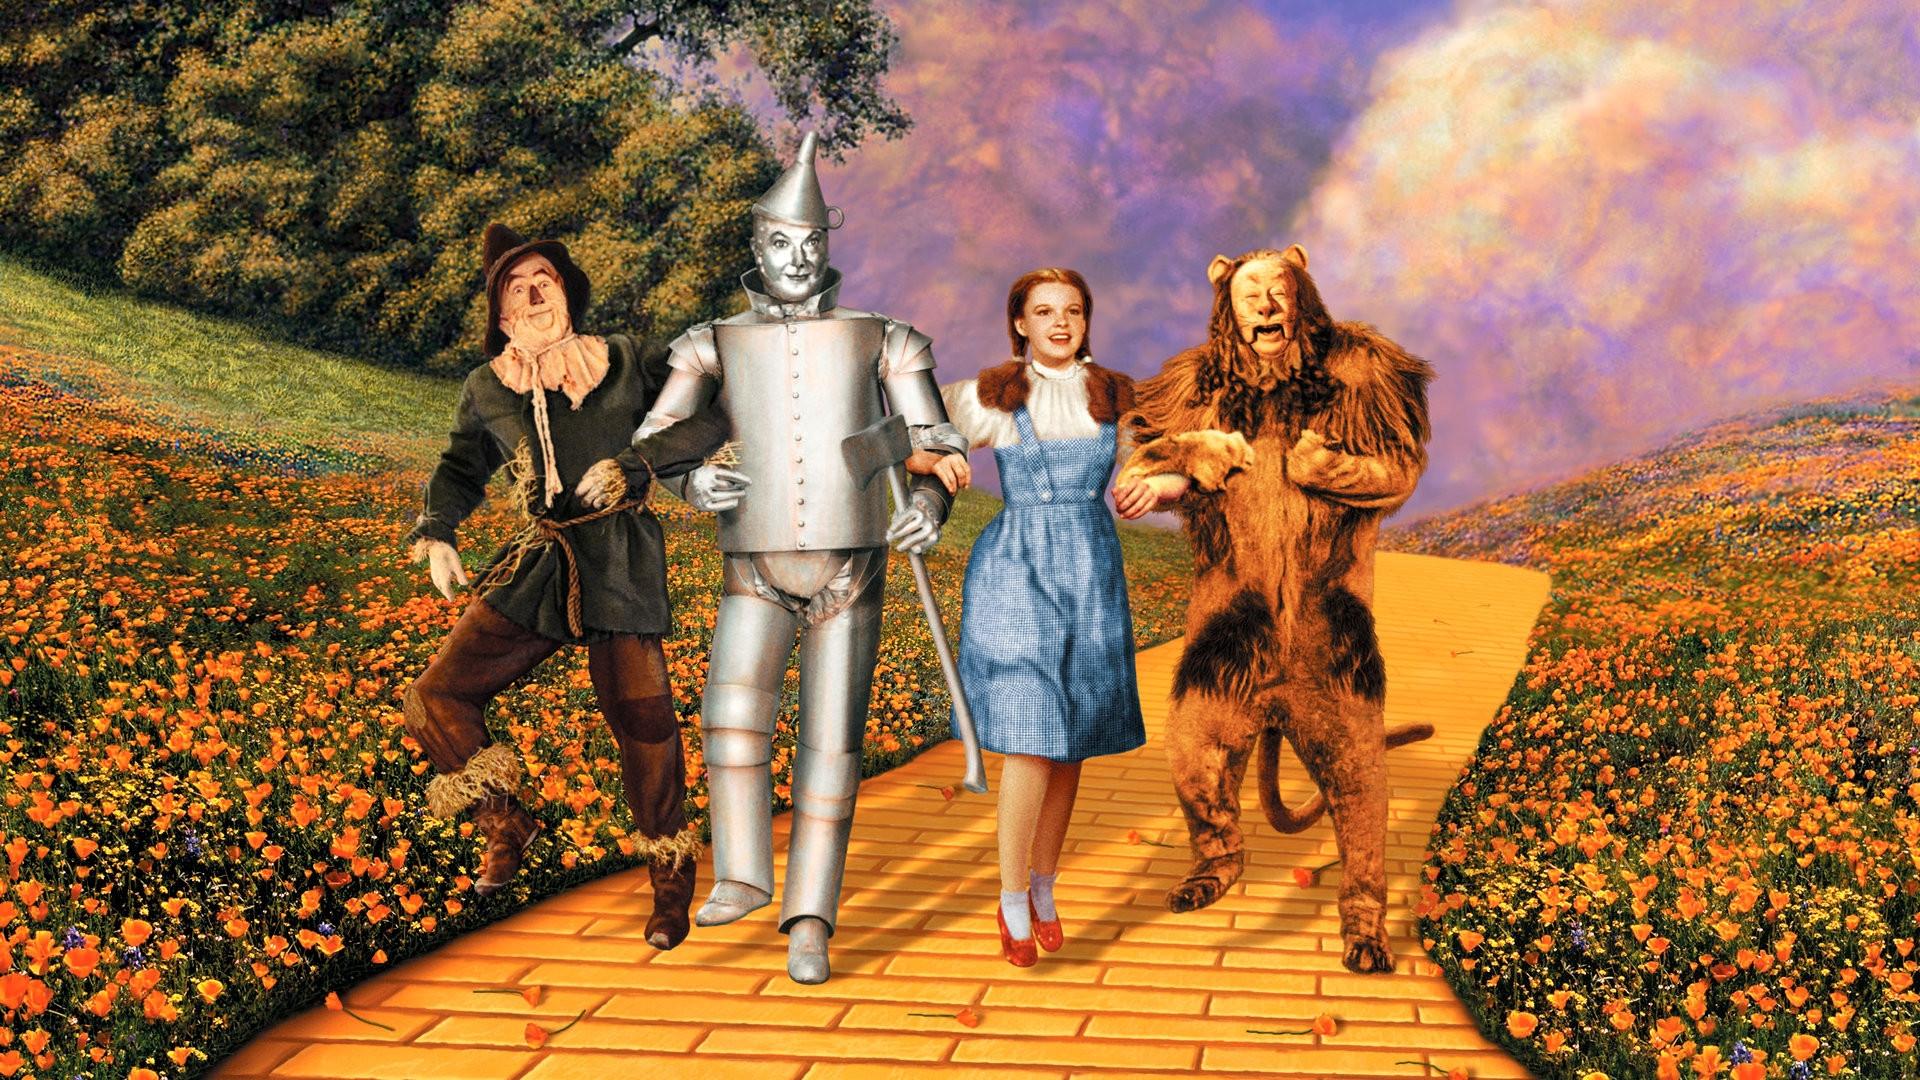 #1) The Wizard of Oz - (1939 - dir.Victor Fleming, King Vidor, George Cukor, Richard Thorpe, Norman Taurog